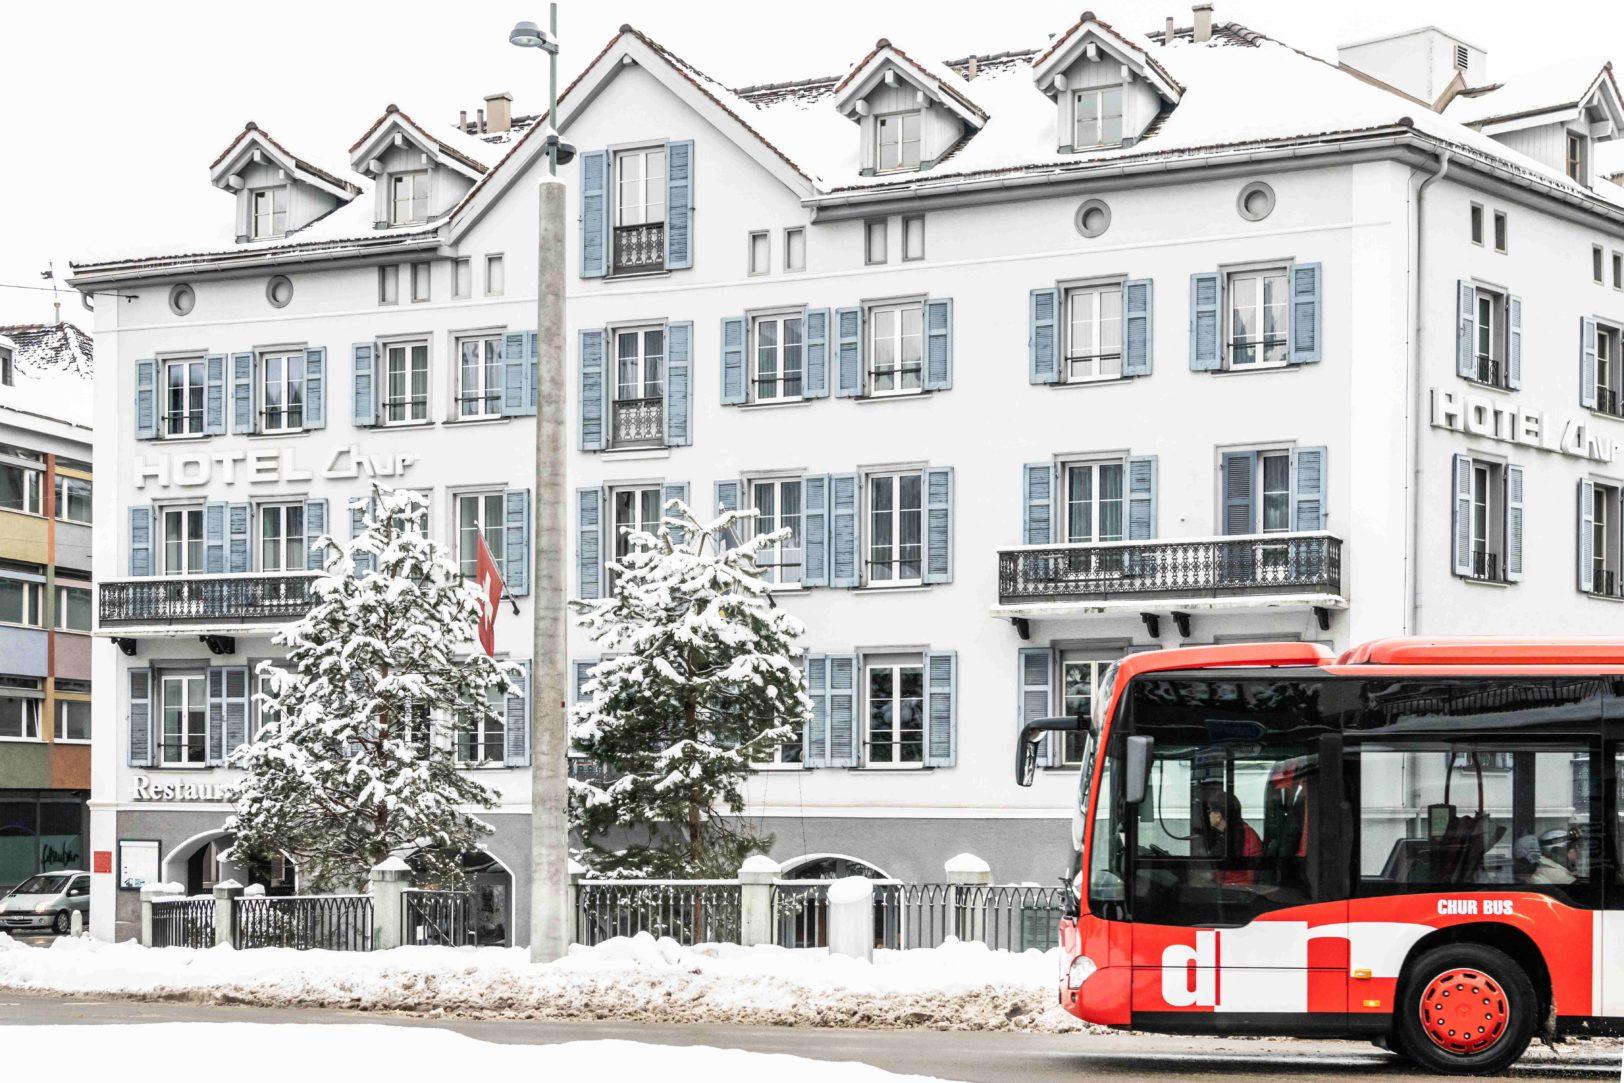 Chur Bus im Stadtzentrum